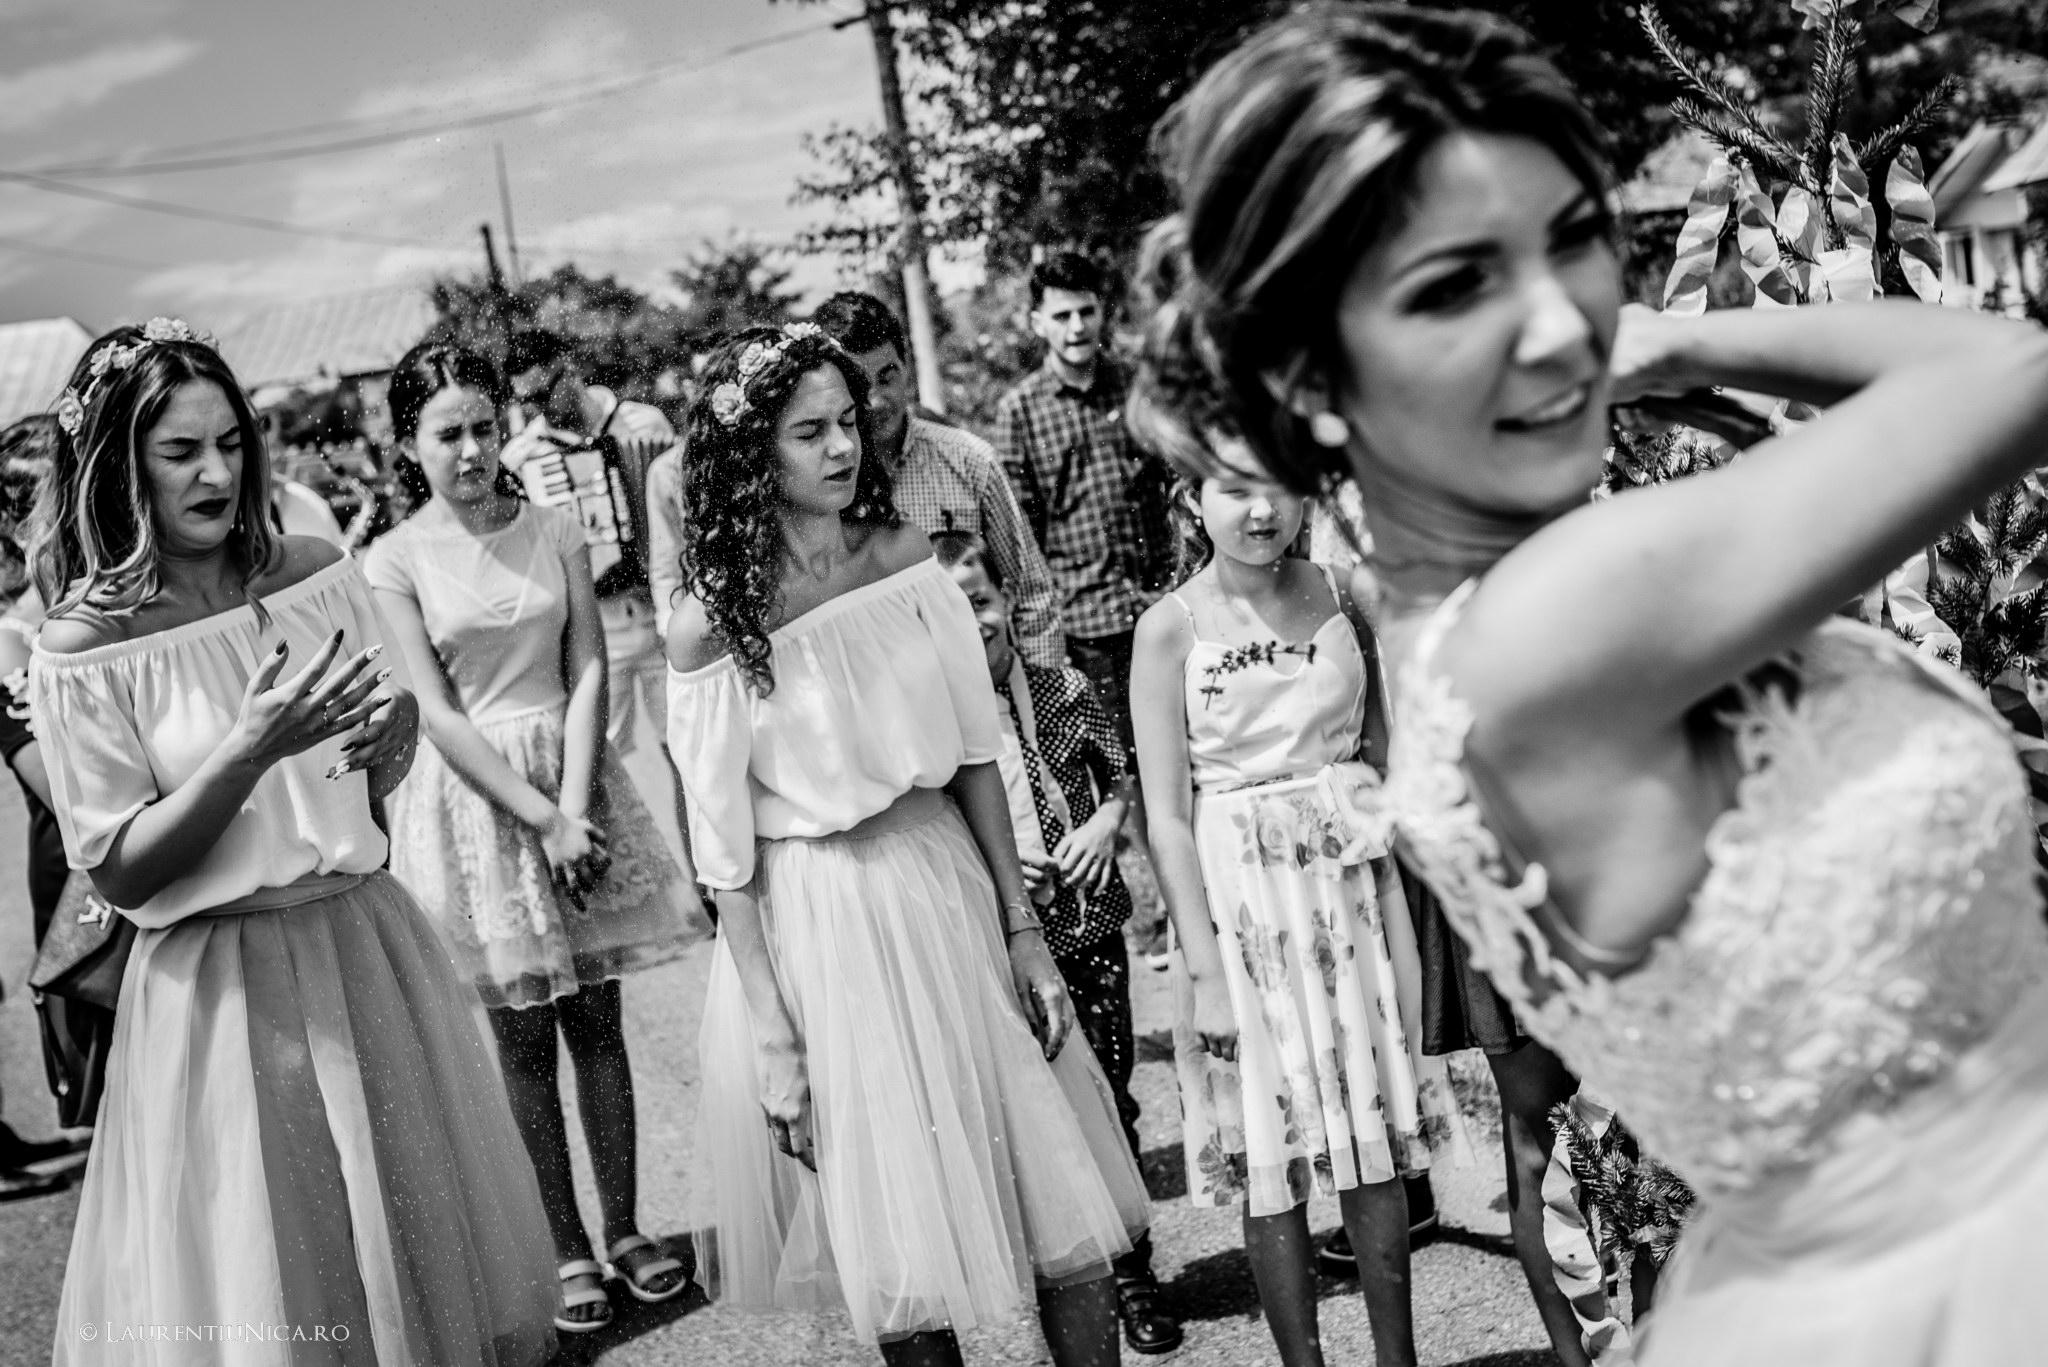 madalina madalin fotograf nunta laurentiu nica turceni gorj 07 - Madalina & Madalin | Fotografii nunta | Judetul Gorj